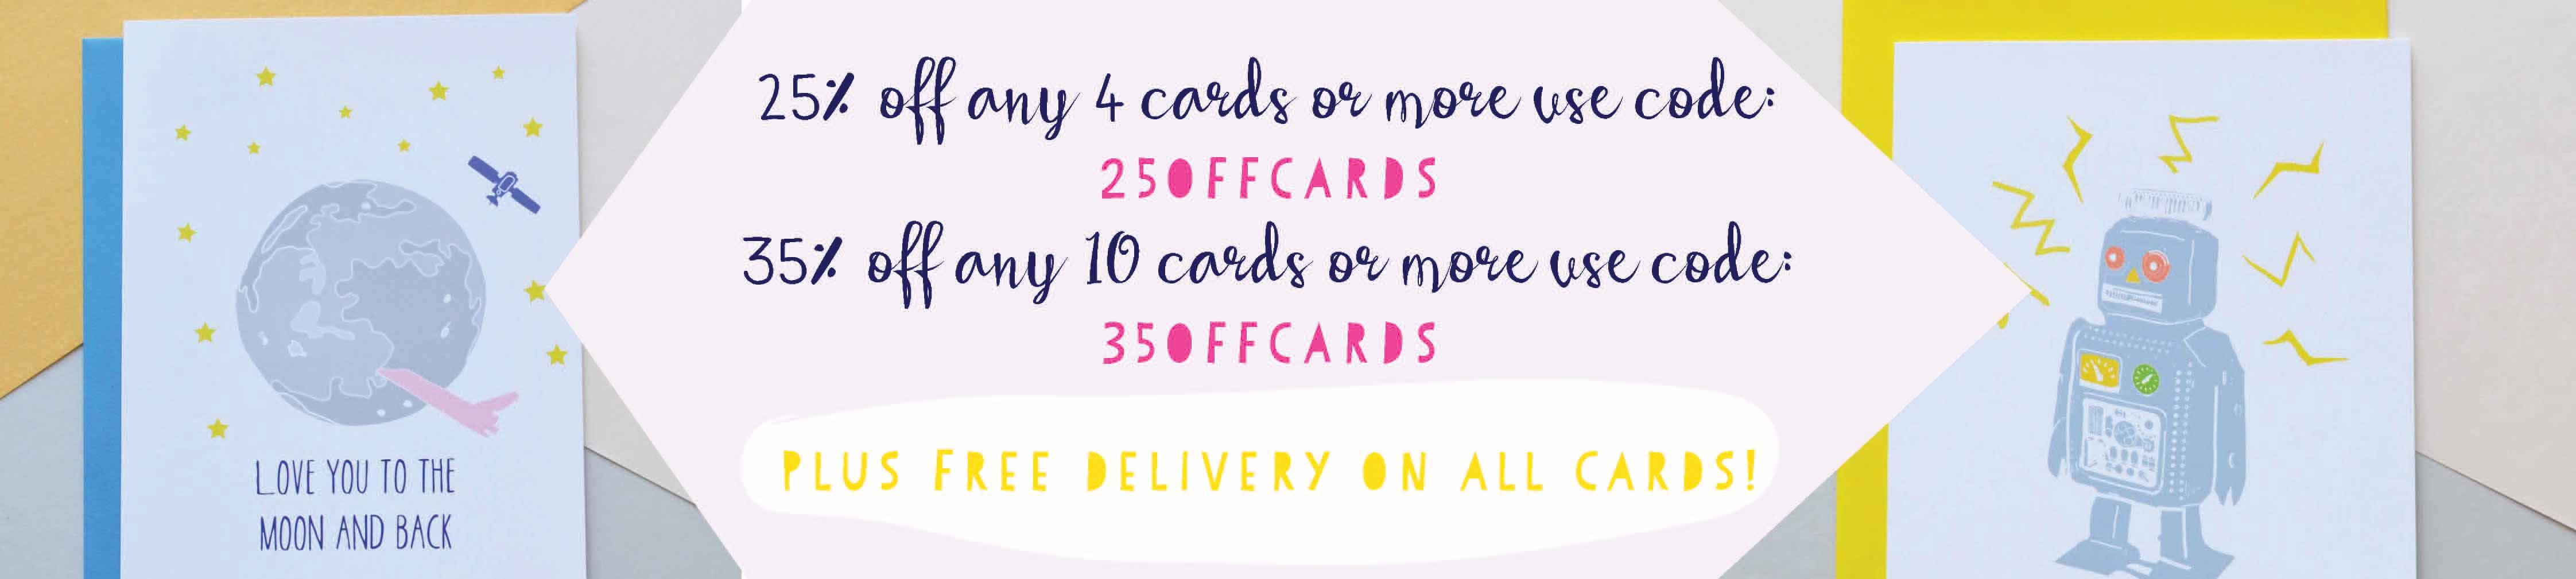 cards-online-banner-2.jpg